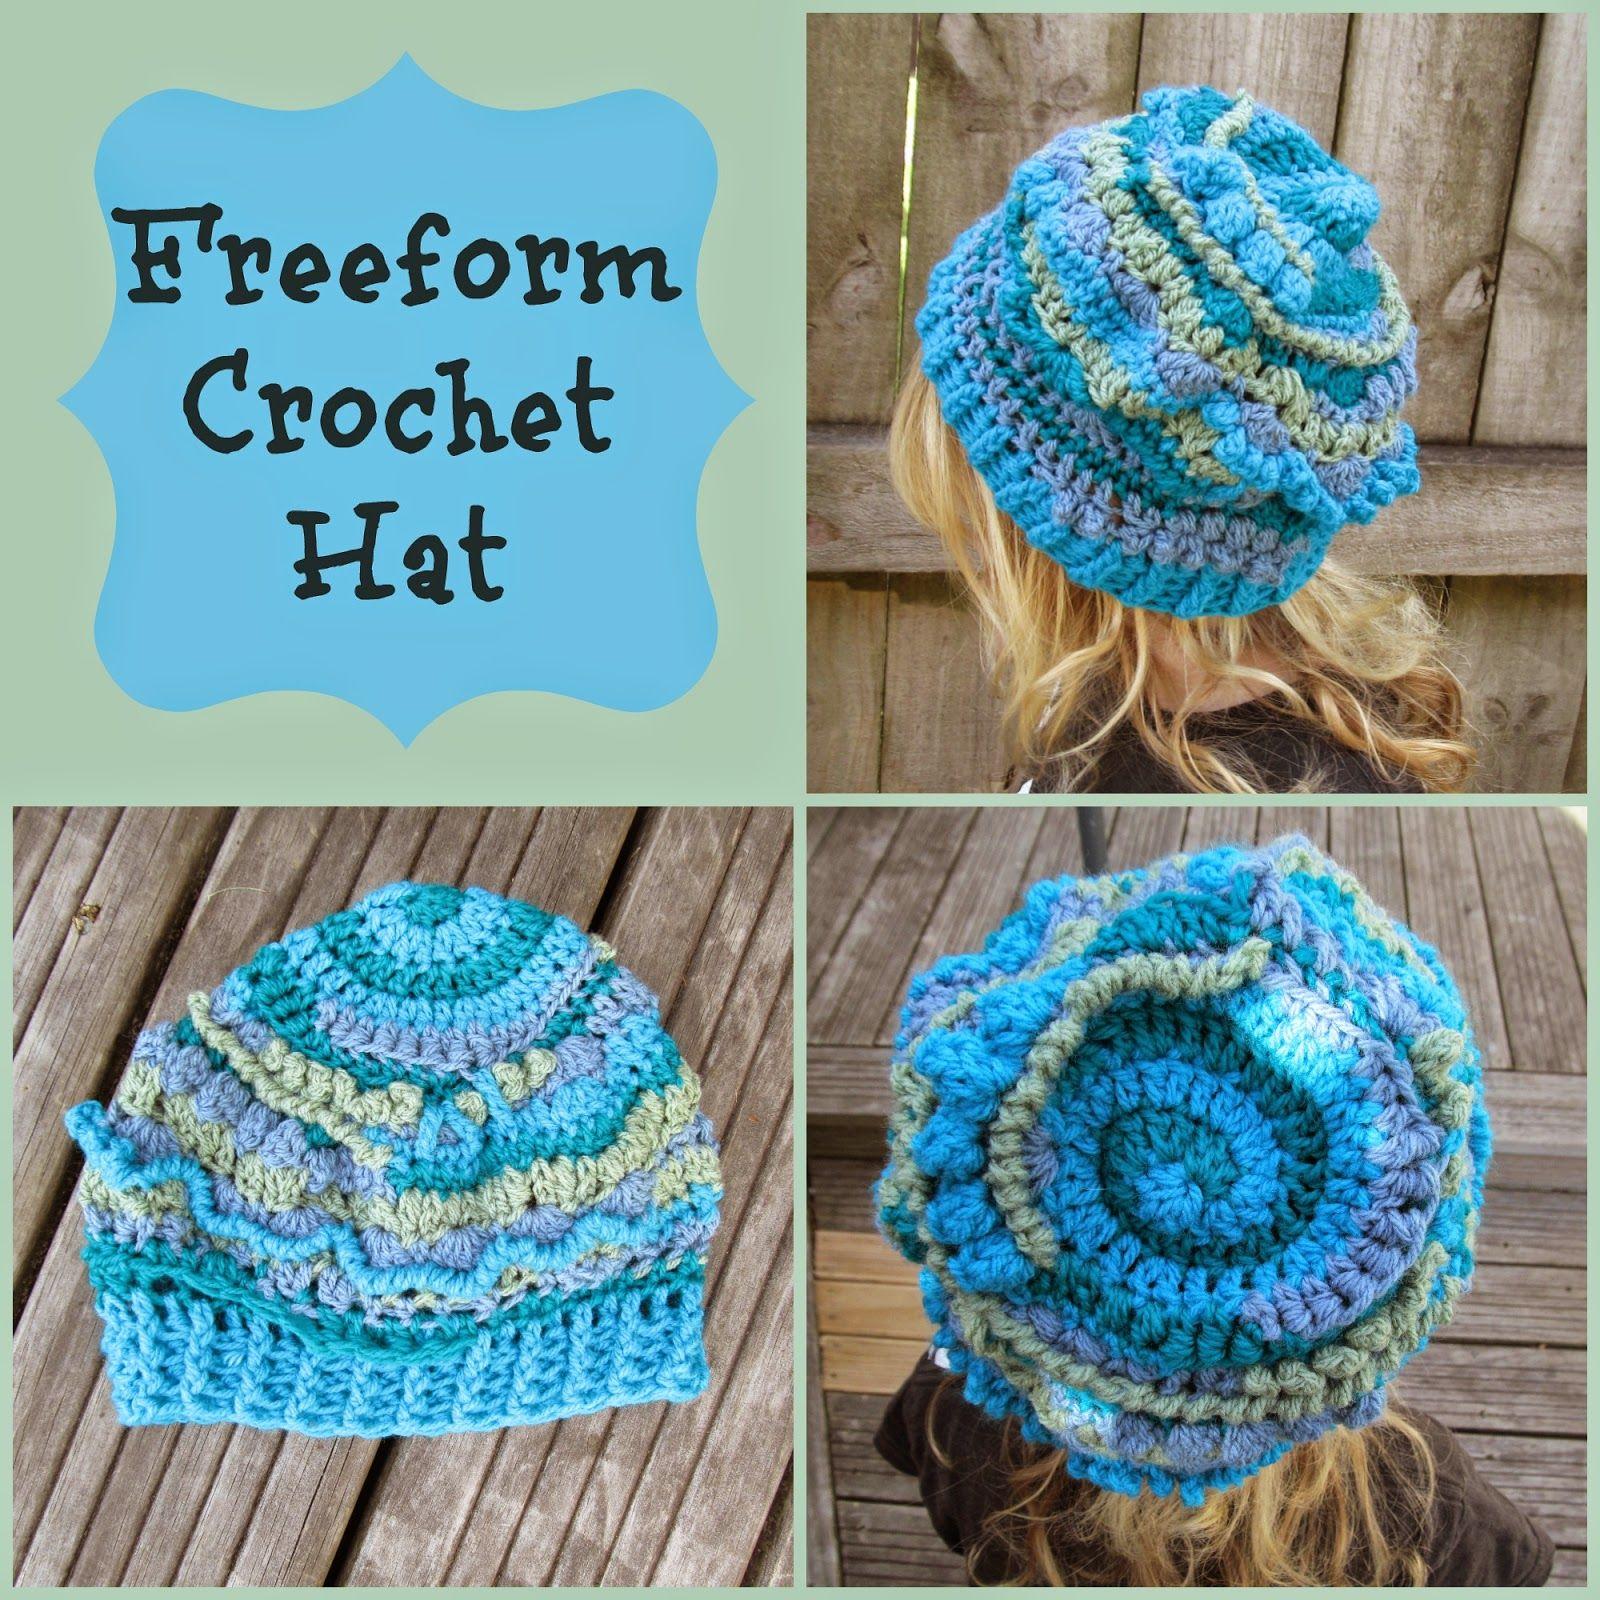 Crochet♡freeform On Pinterest 796 Pins